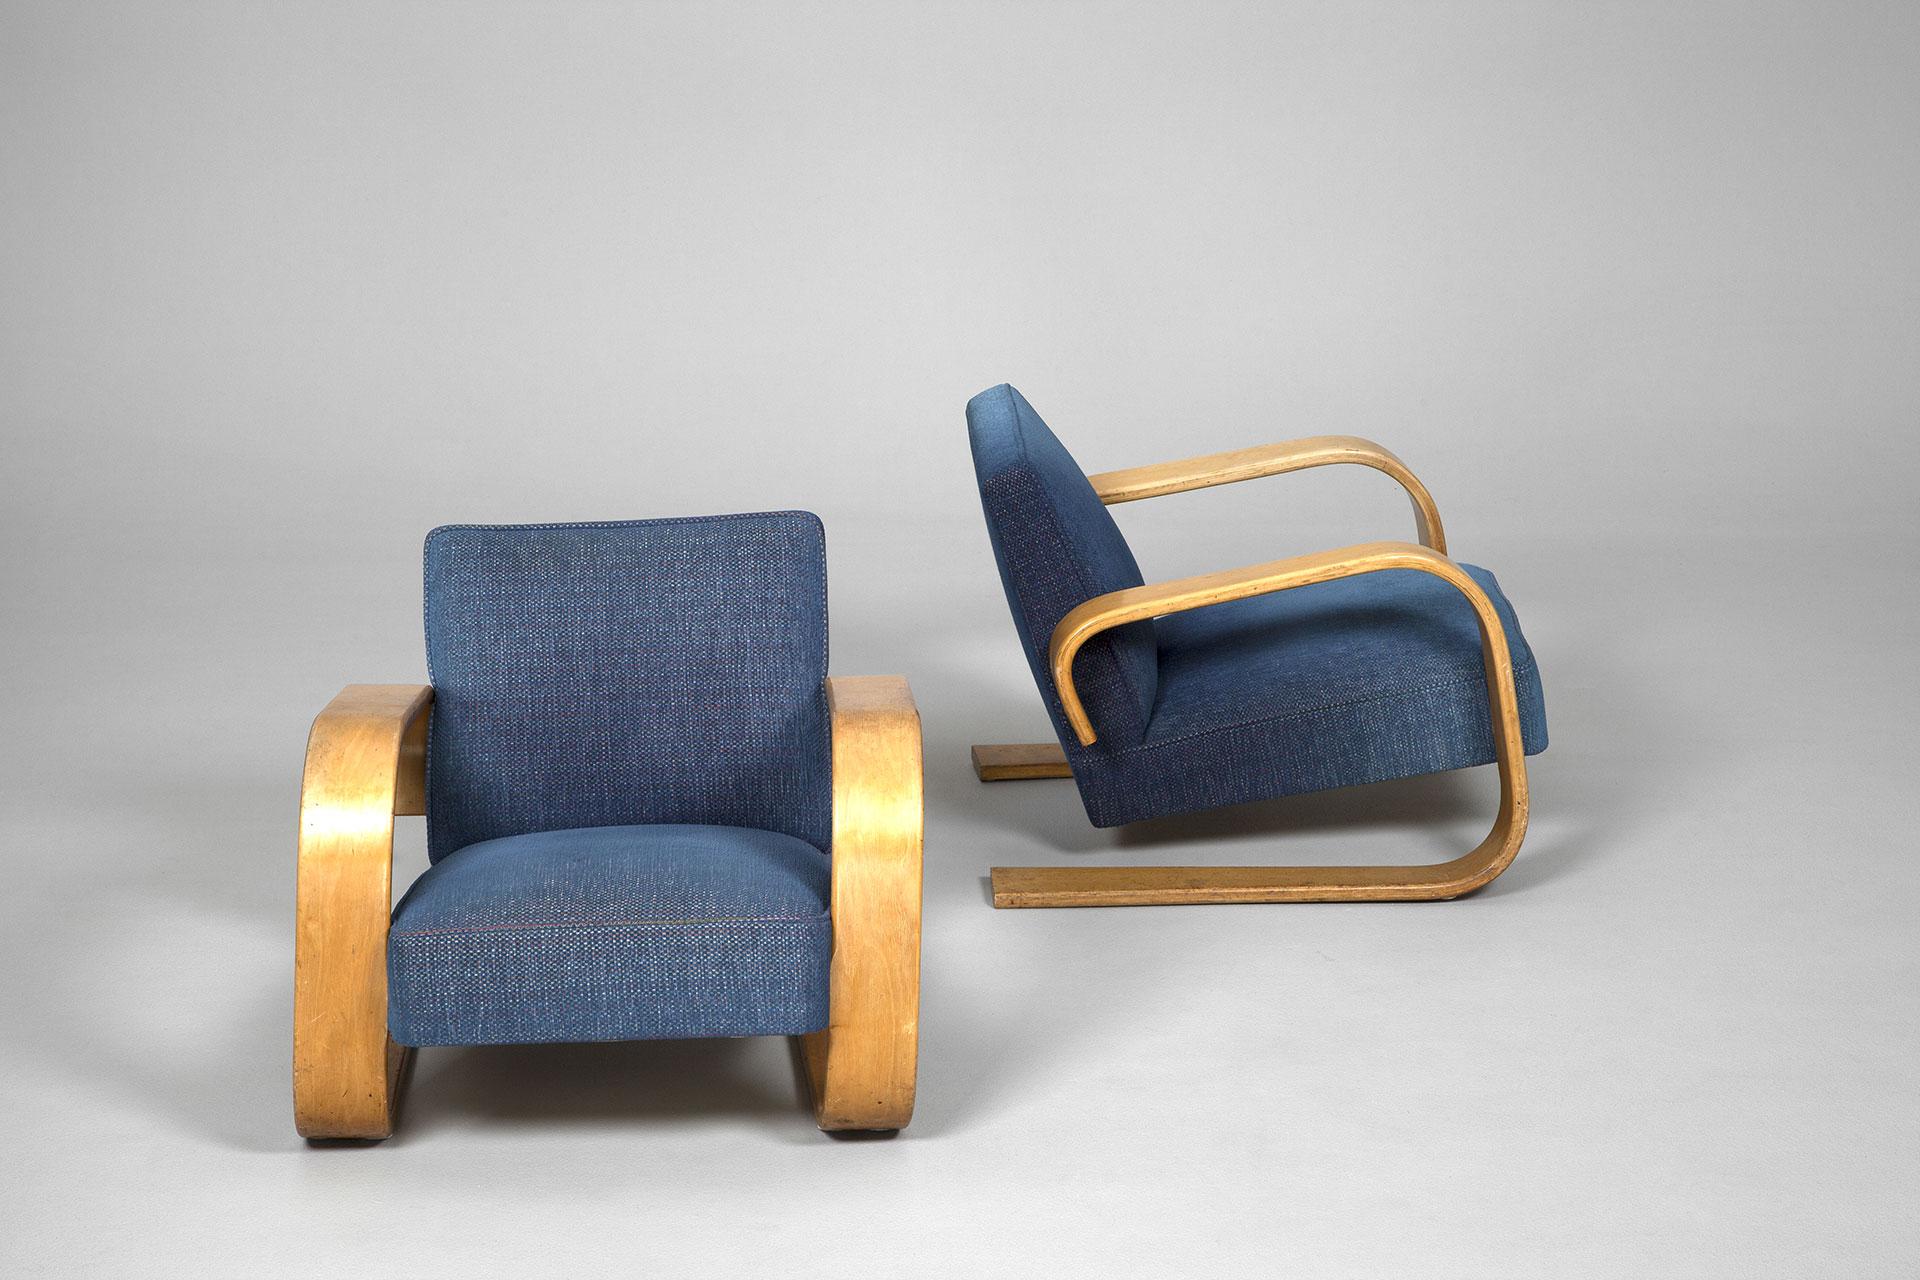 Jacksons Pair of Tank Chairs Alvar Aalto